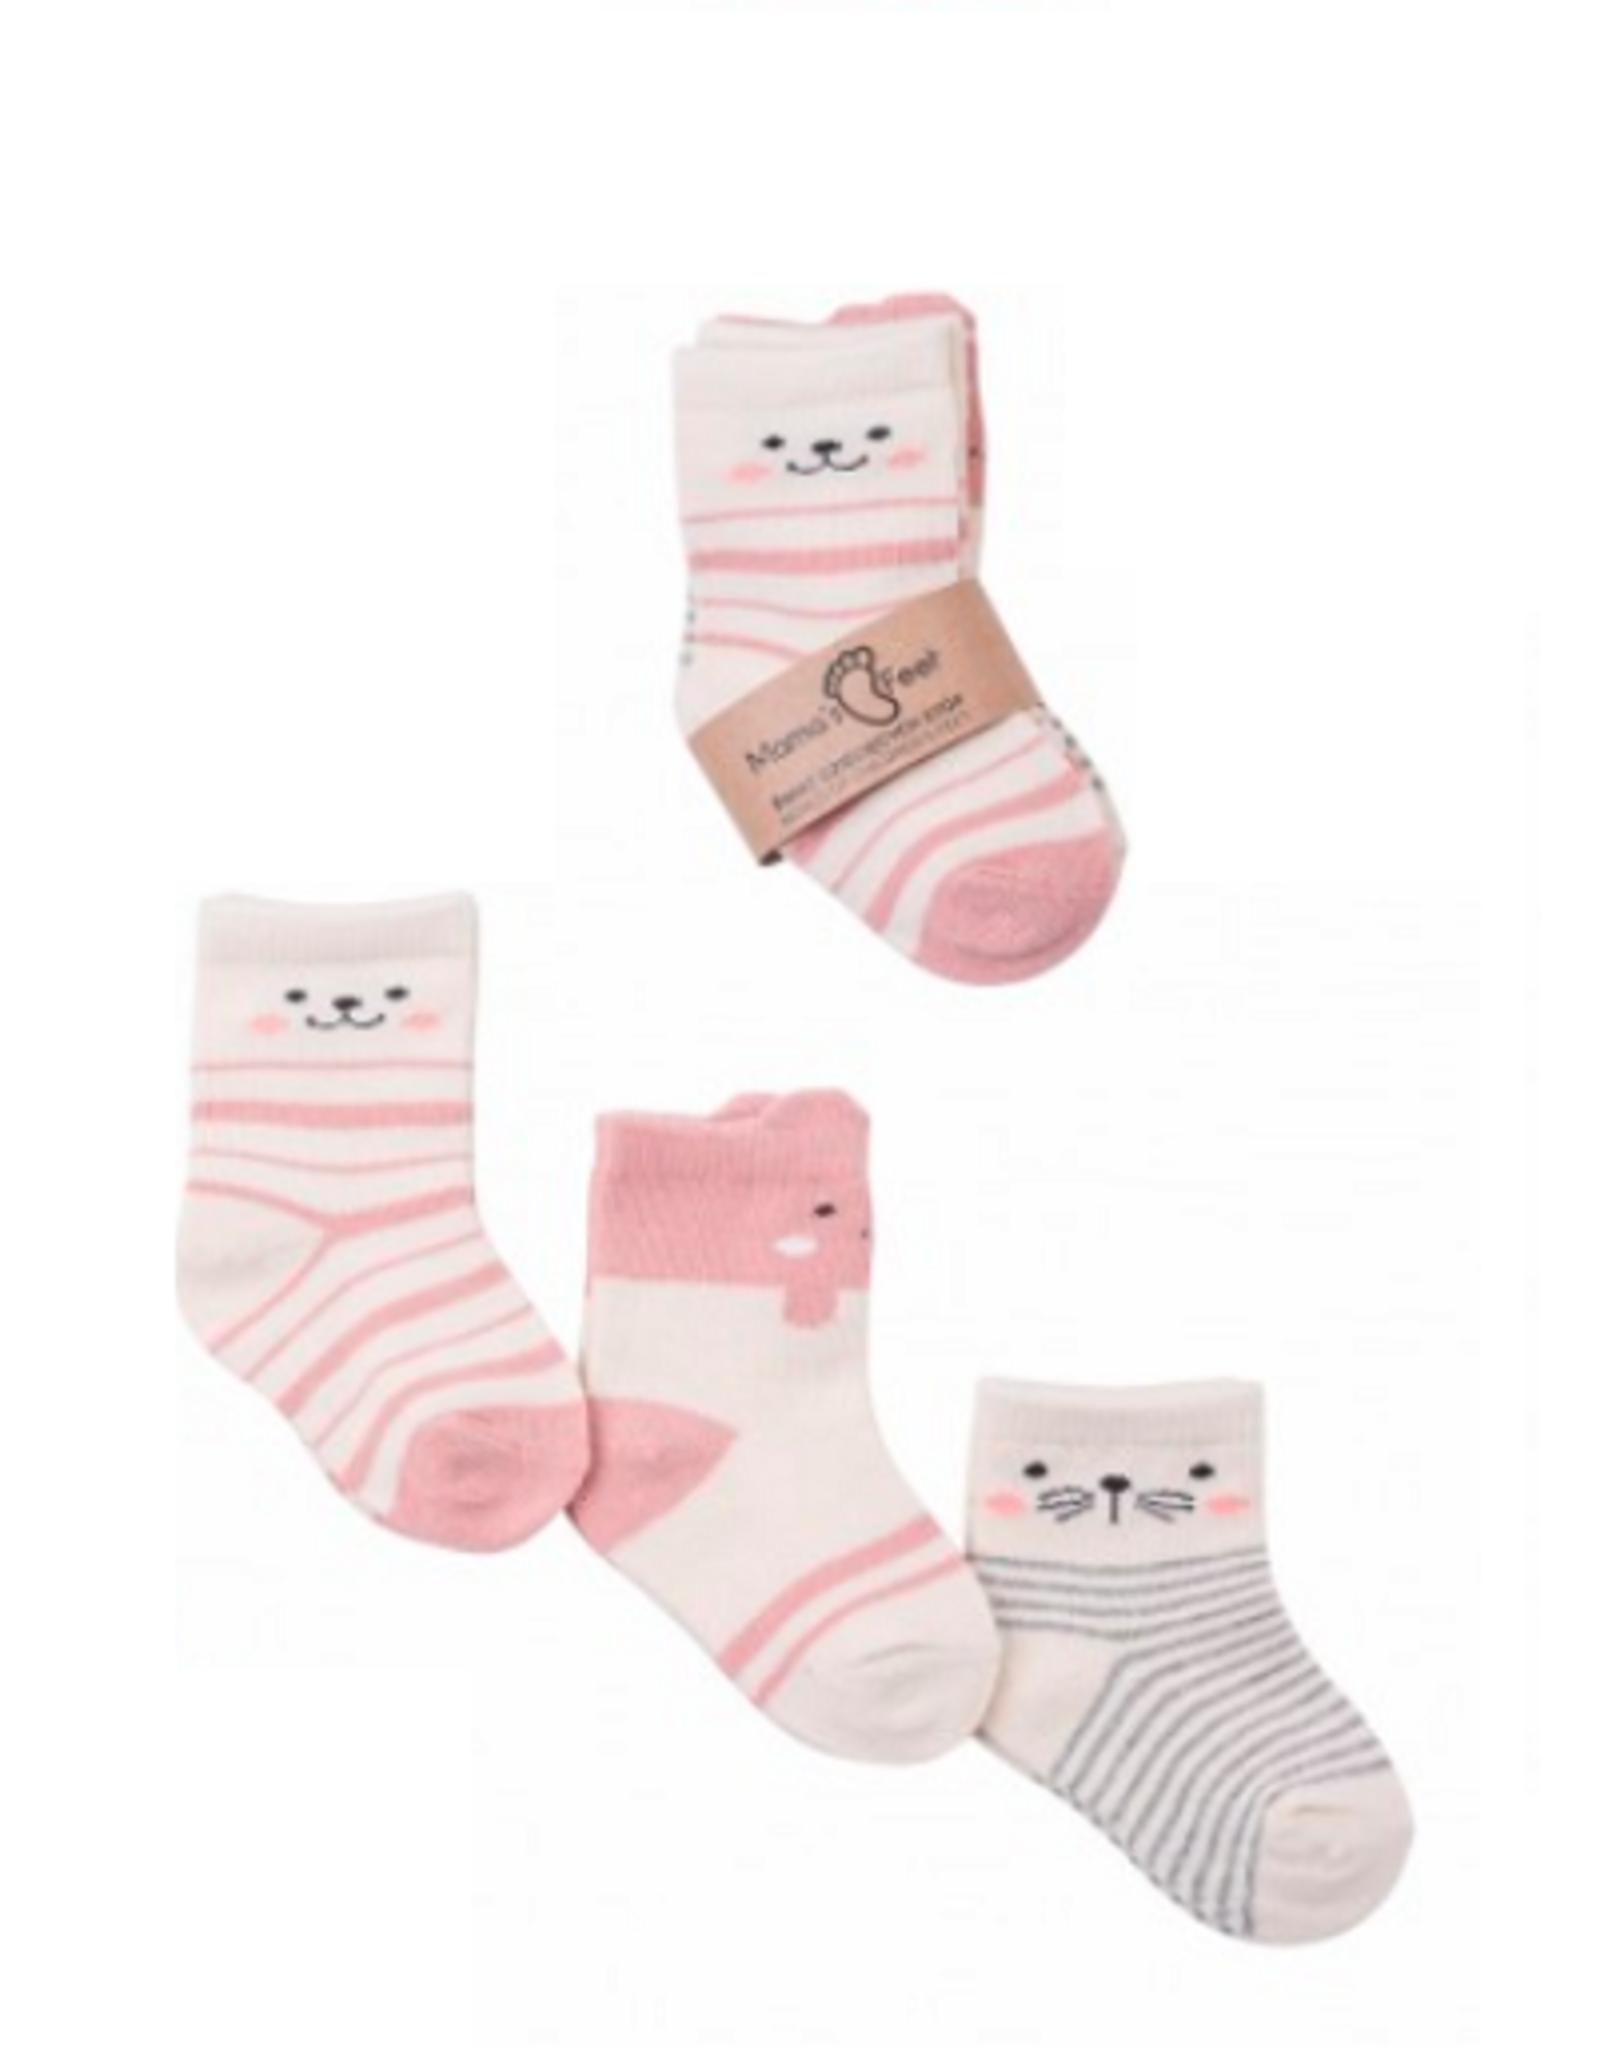 Mama's feet Leuke kinderkousjes 3 paar